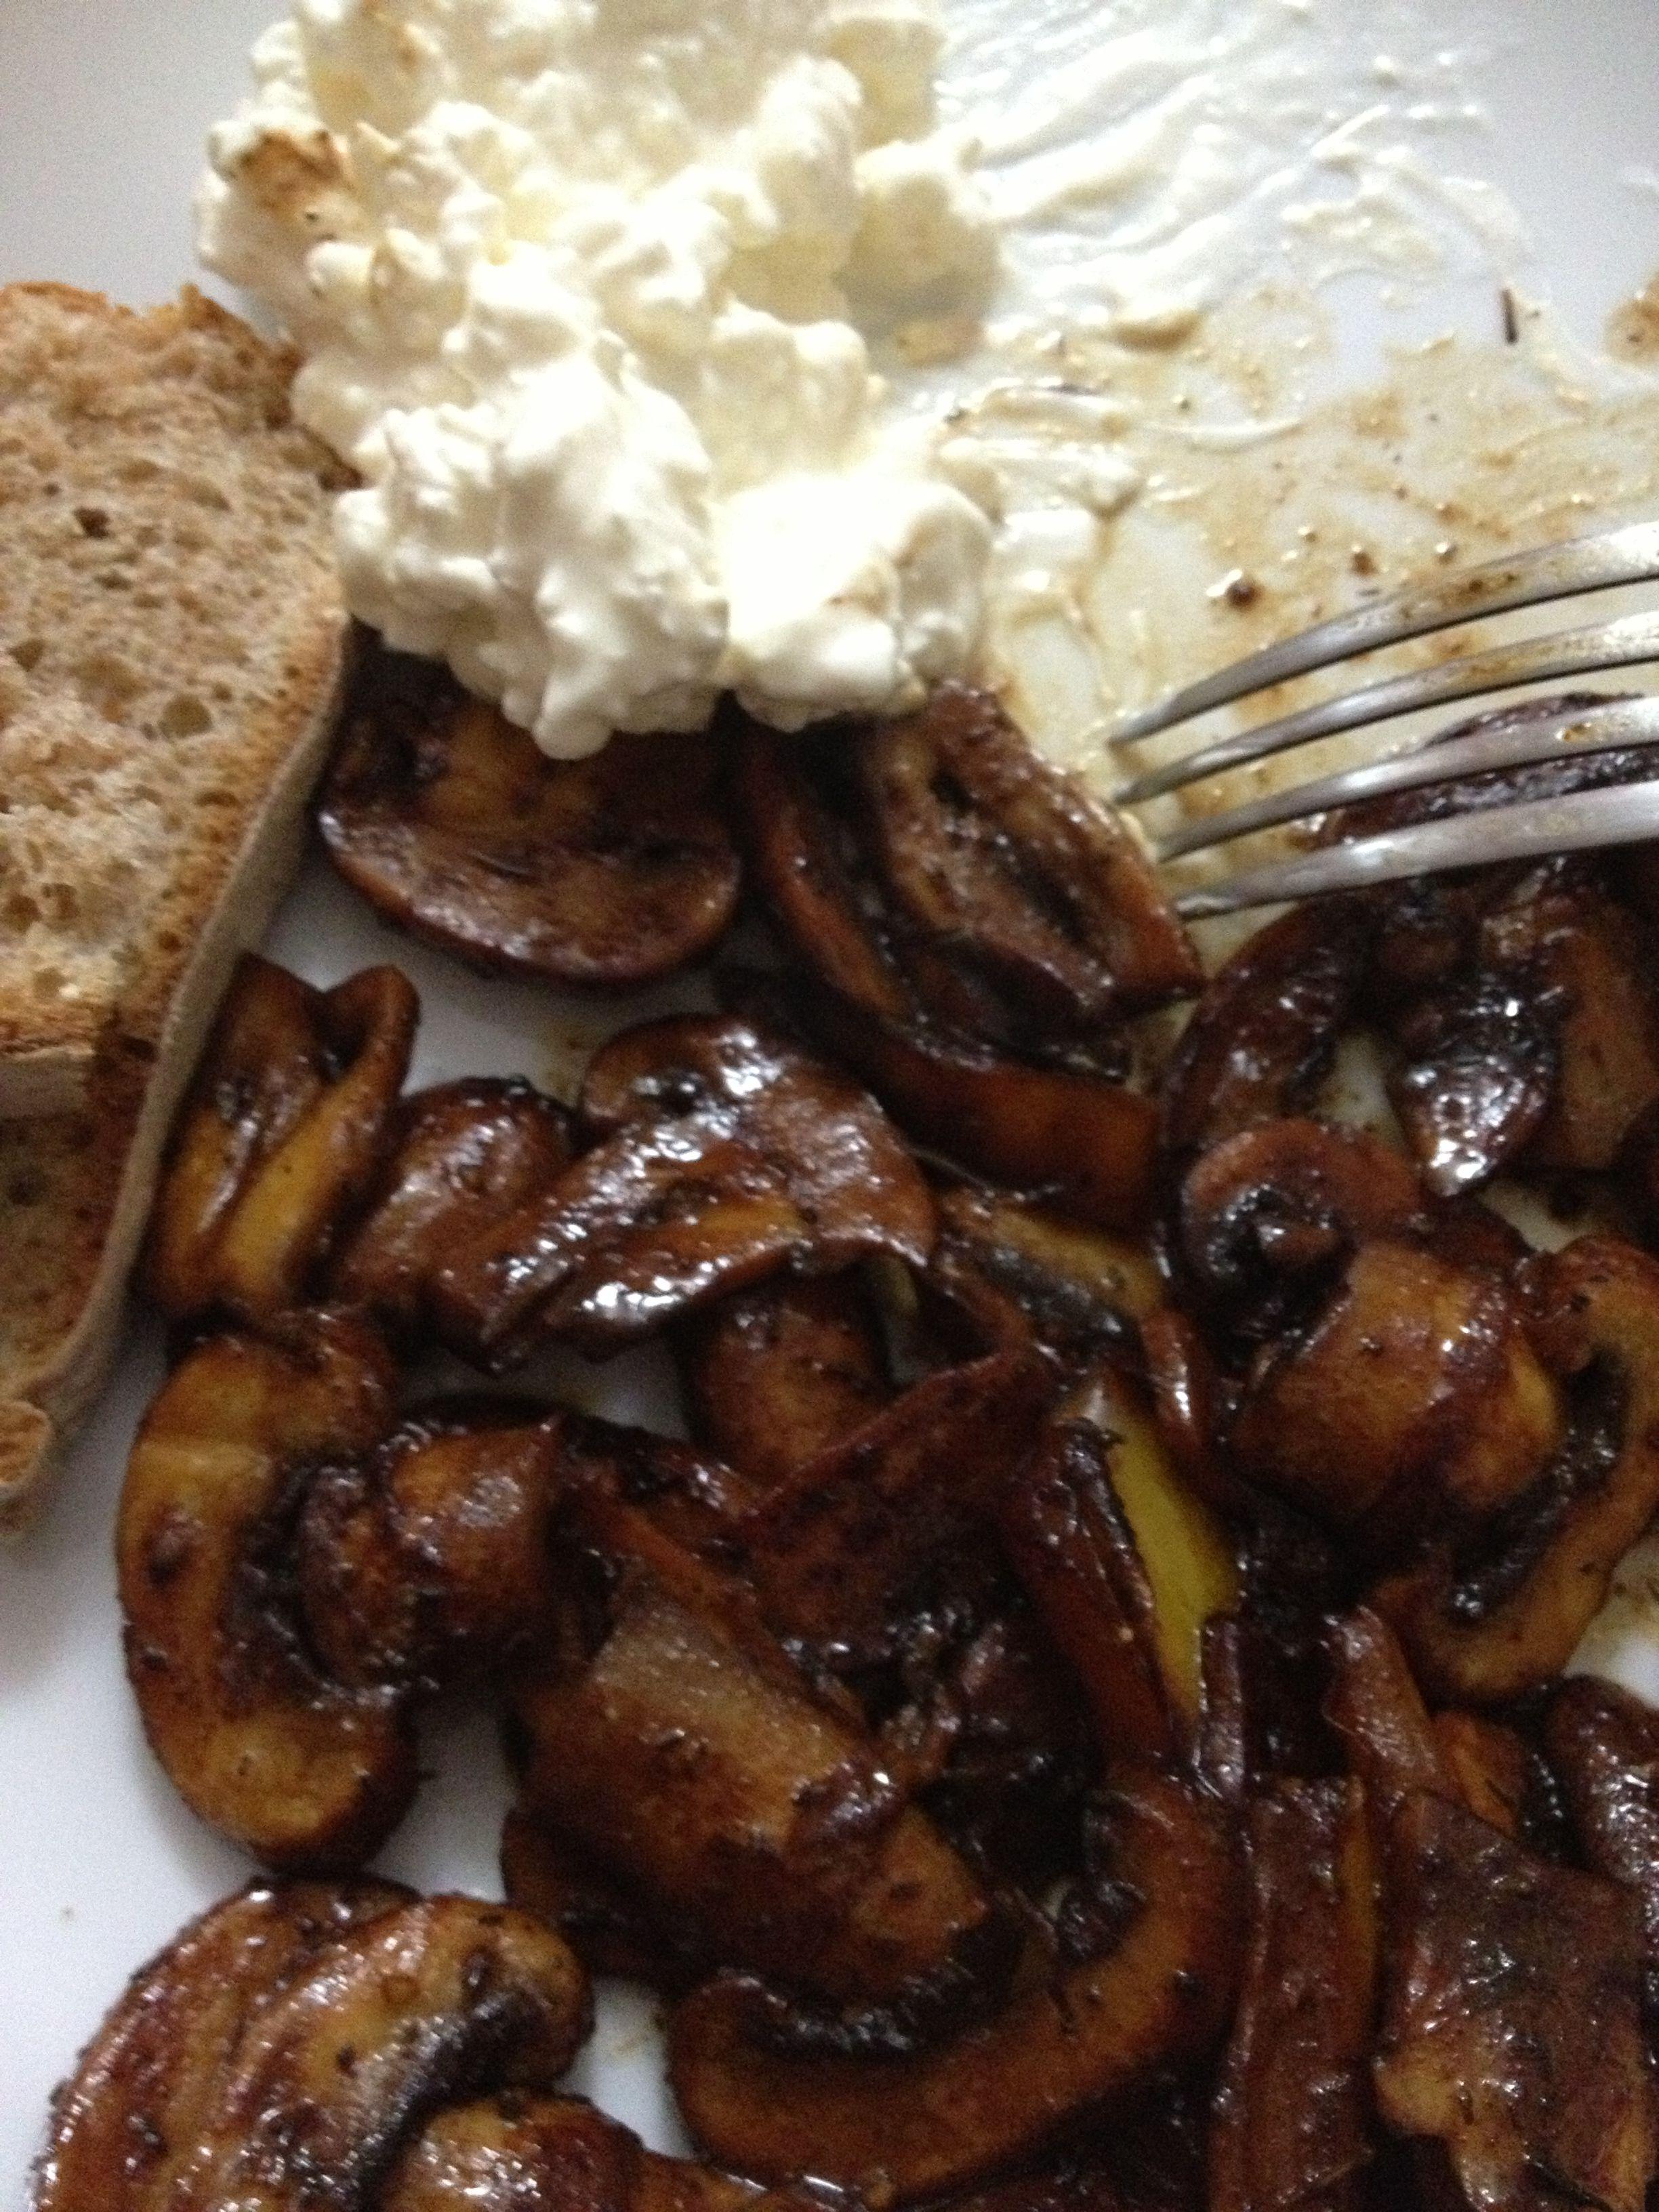 Garlic Butter & Soy Sauce Mushrooms | Recipe in 2020